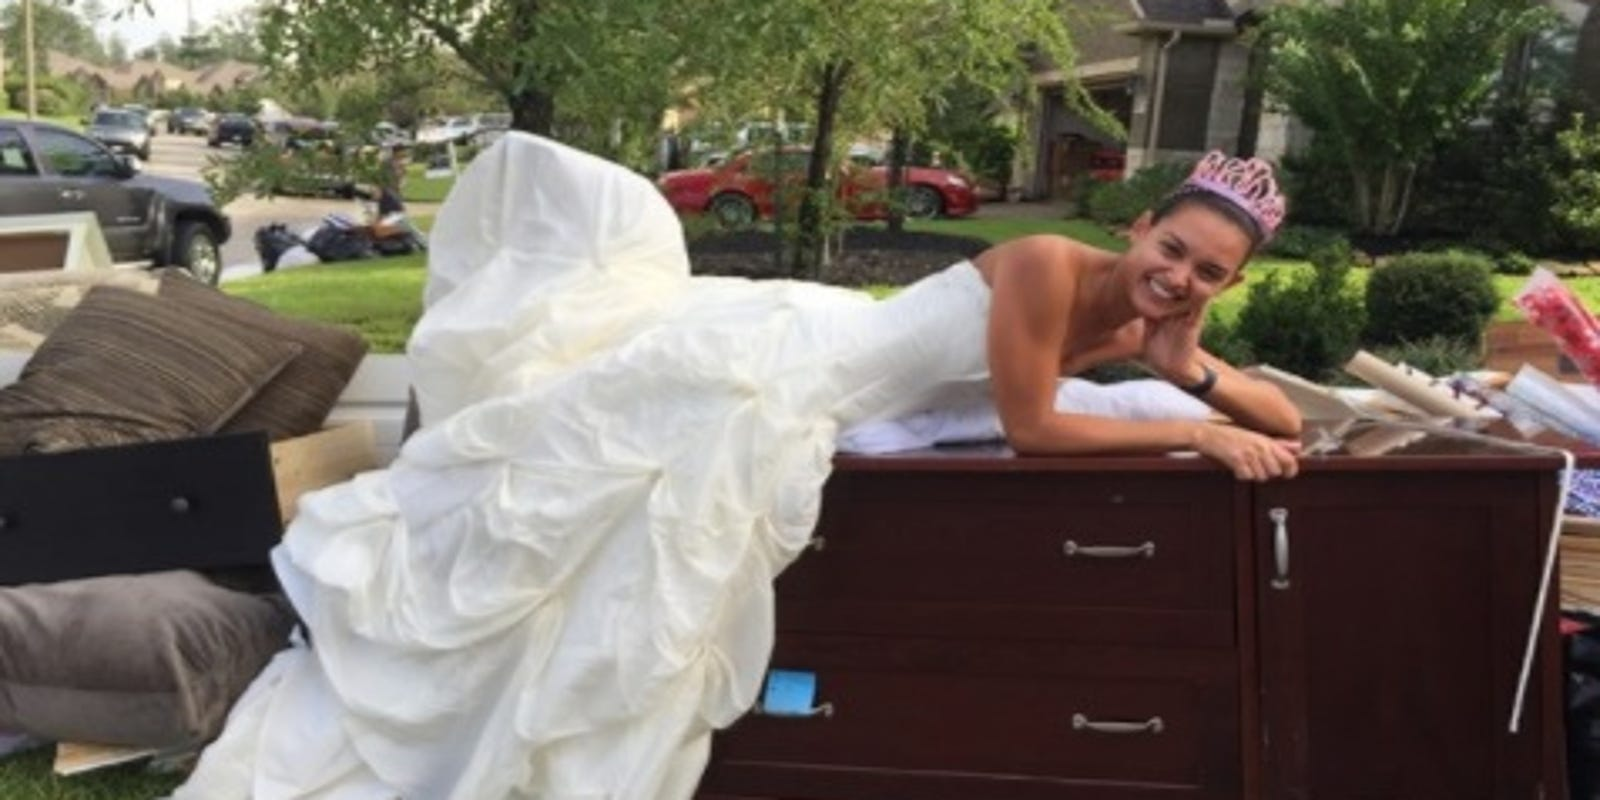 daf91ab2d00a Harvey flooding soaked her wedding dress but didn't dampen her spirit